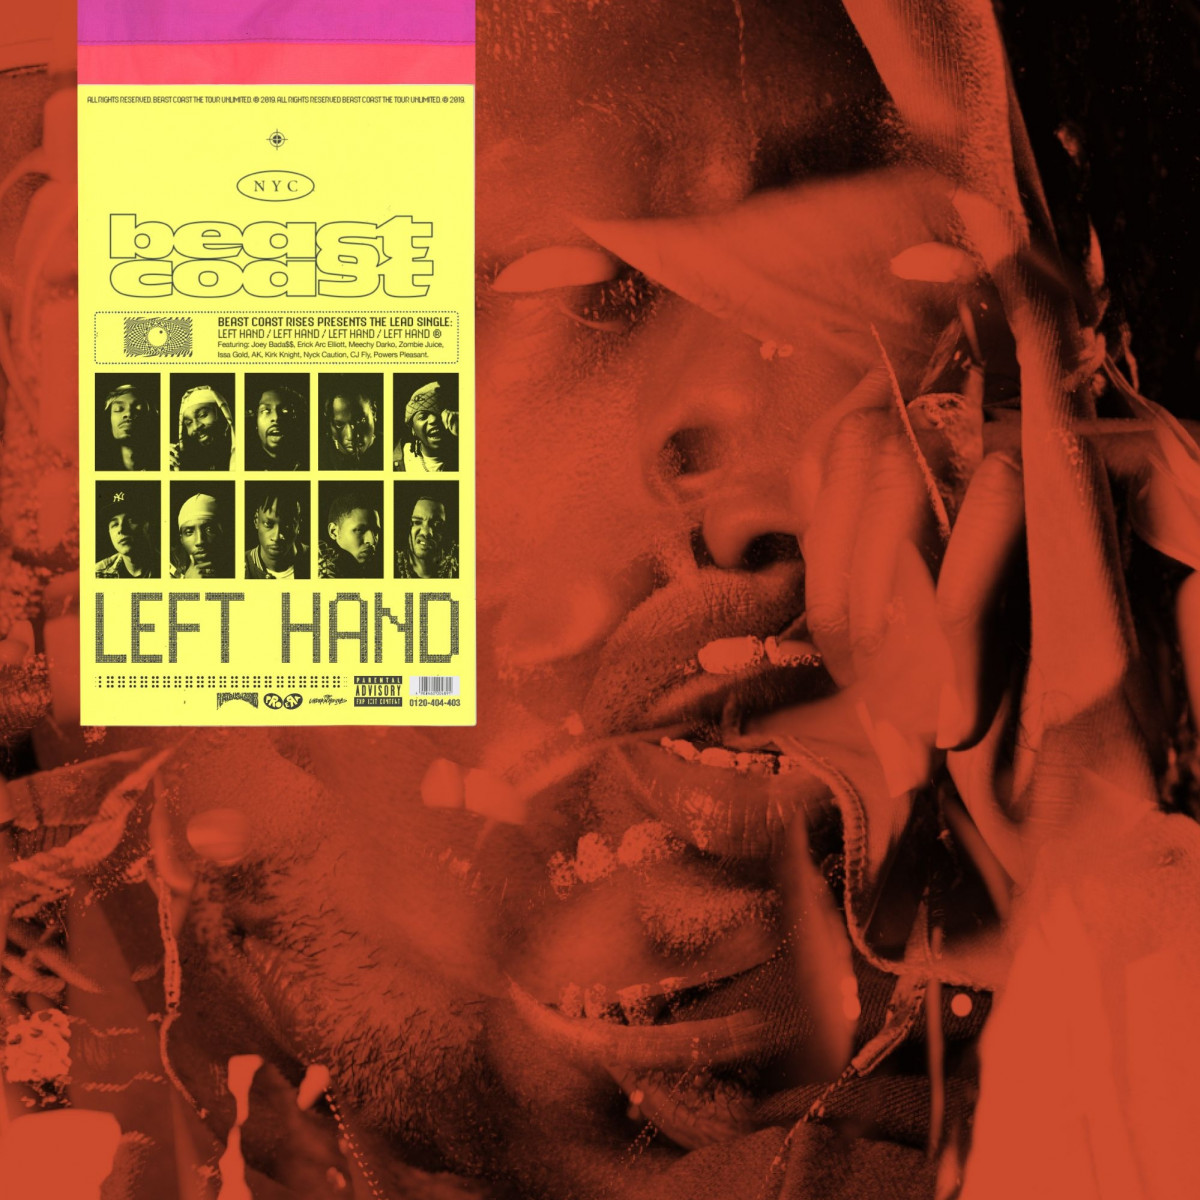 Beast Coast — «Left Hand» (Feat. Joey Bada$$, Flatbush ZOMBiES, The Underachievers, Kirk Knight, Nyck Caution & CJ Fly)